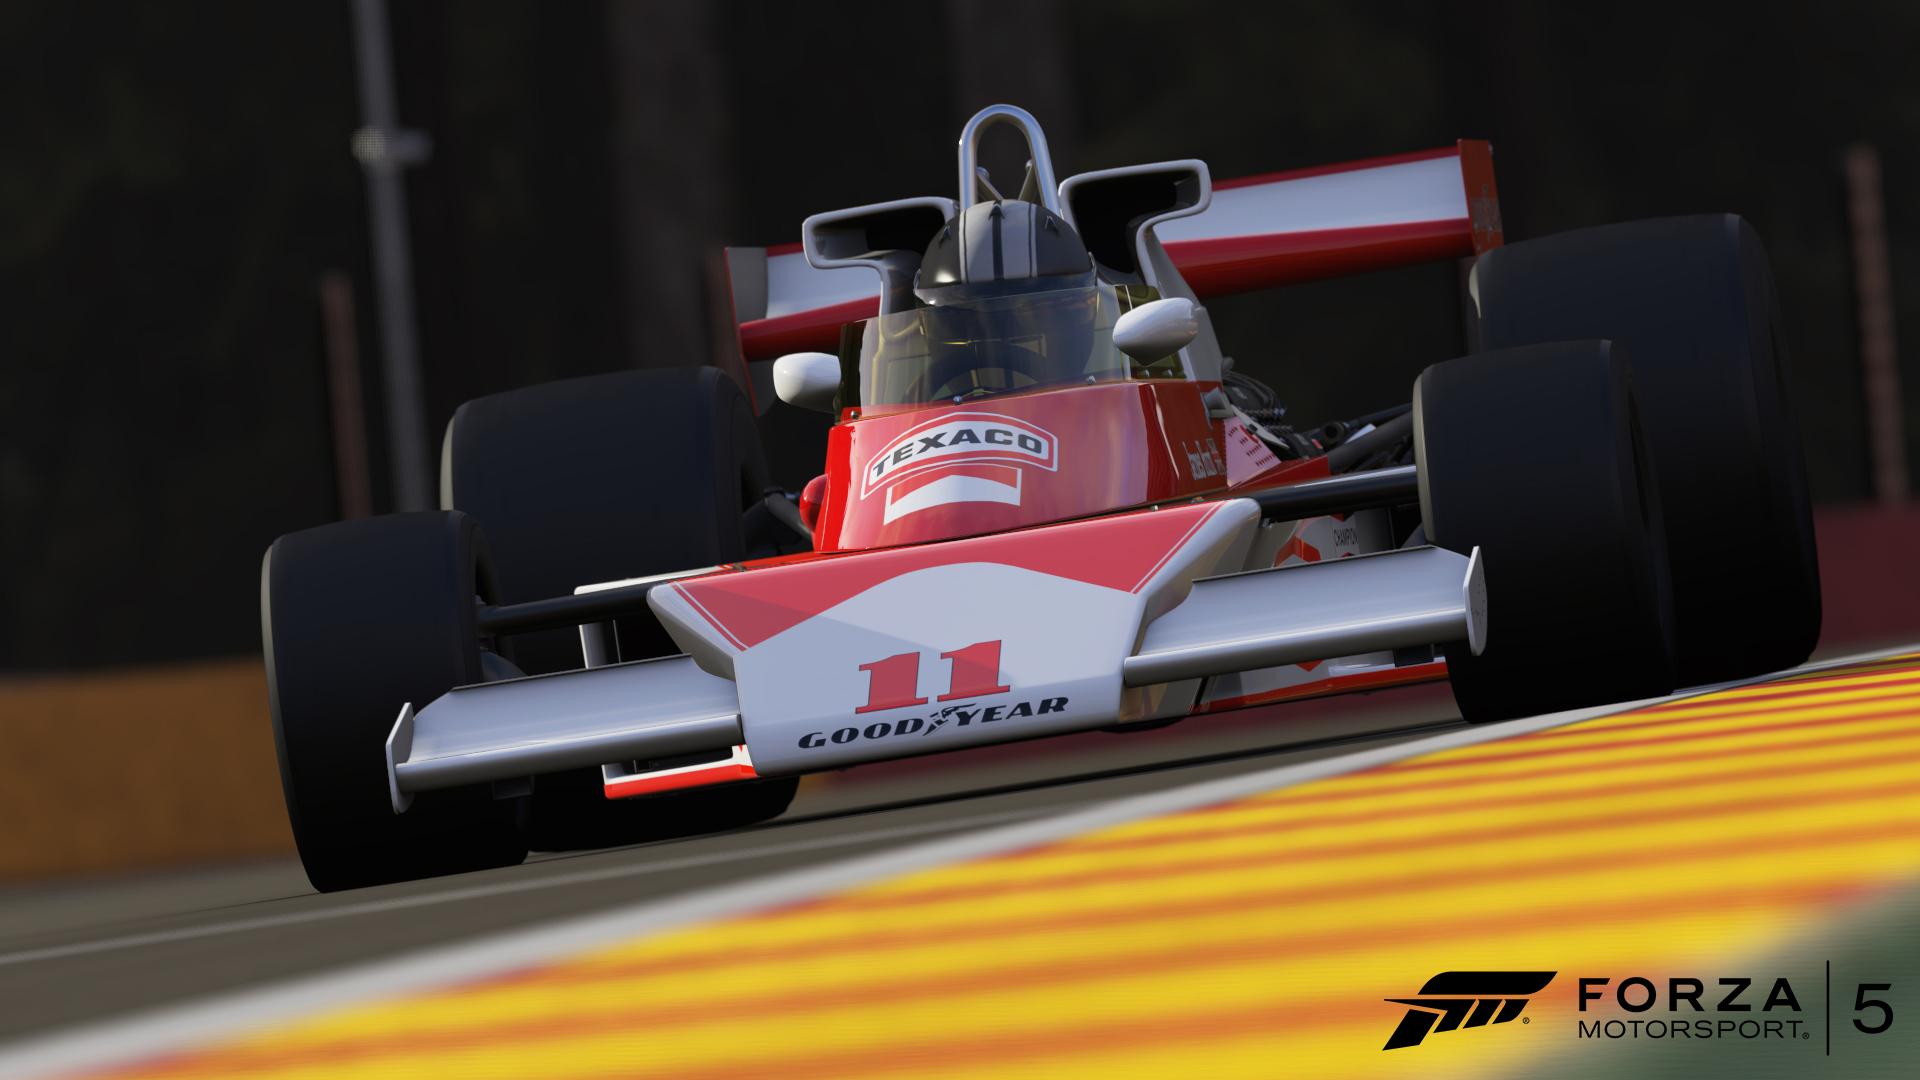 Forza Motorsport 5 Showroom Update Week 7 And Full On